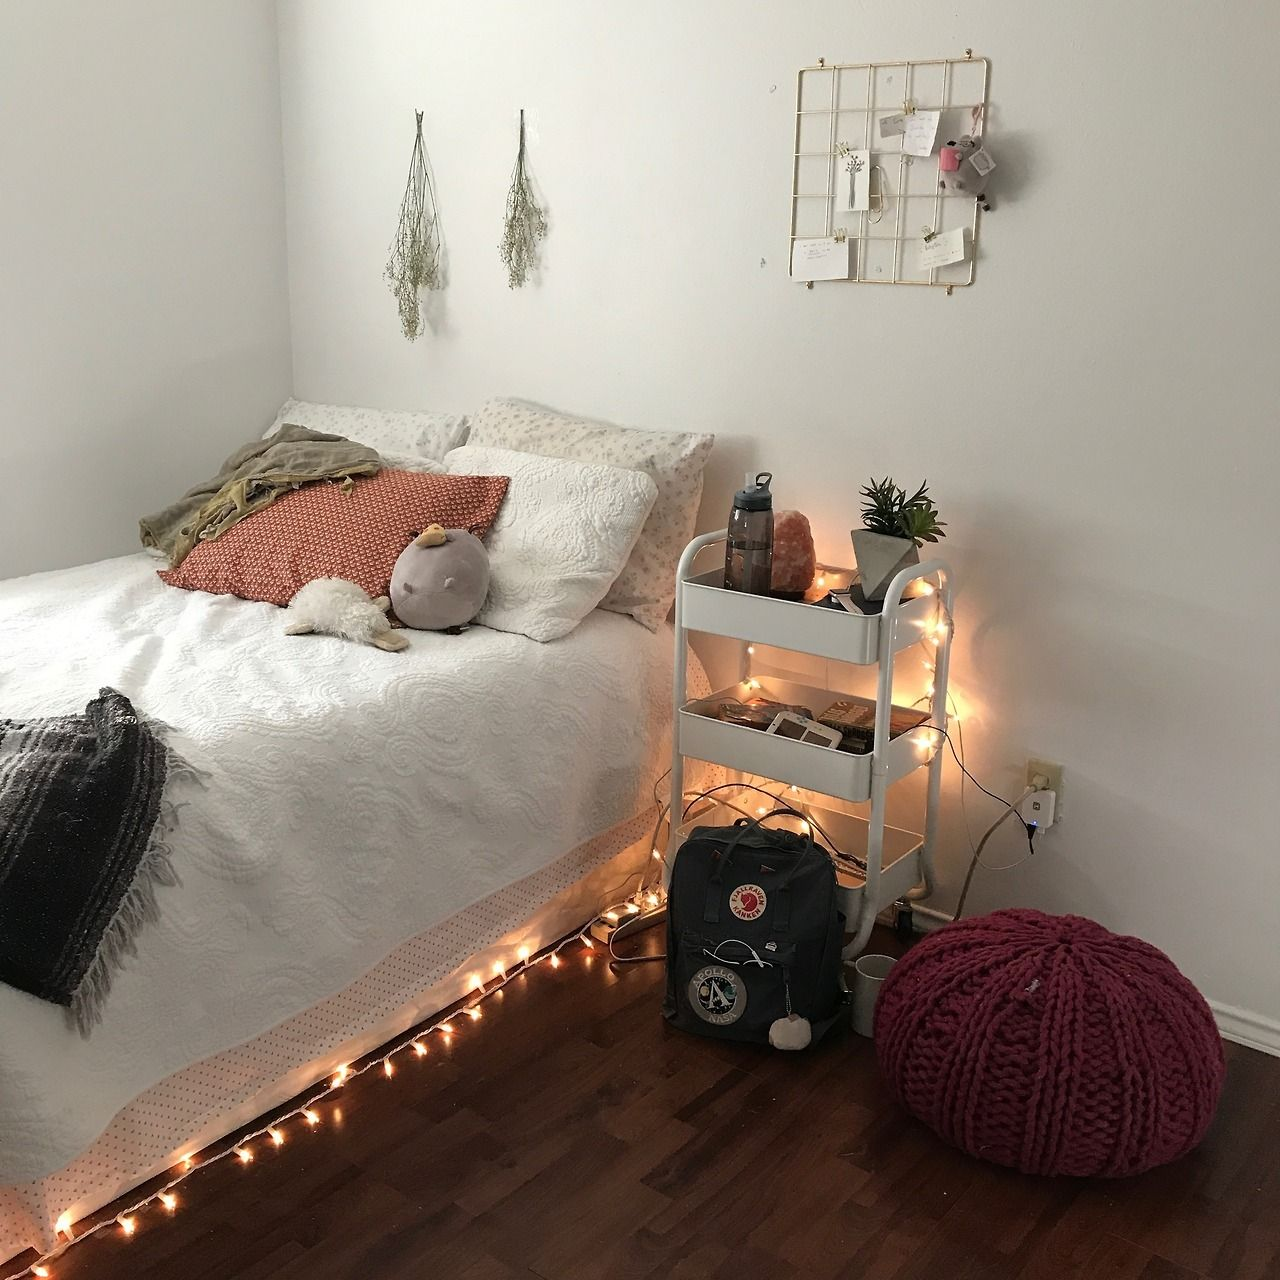 Theologianstudies So I Rearranged My Room Last Night And I Didn T Cozy Dorm Room Bedroom Design Apartment Decor